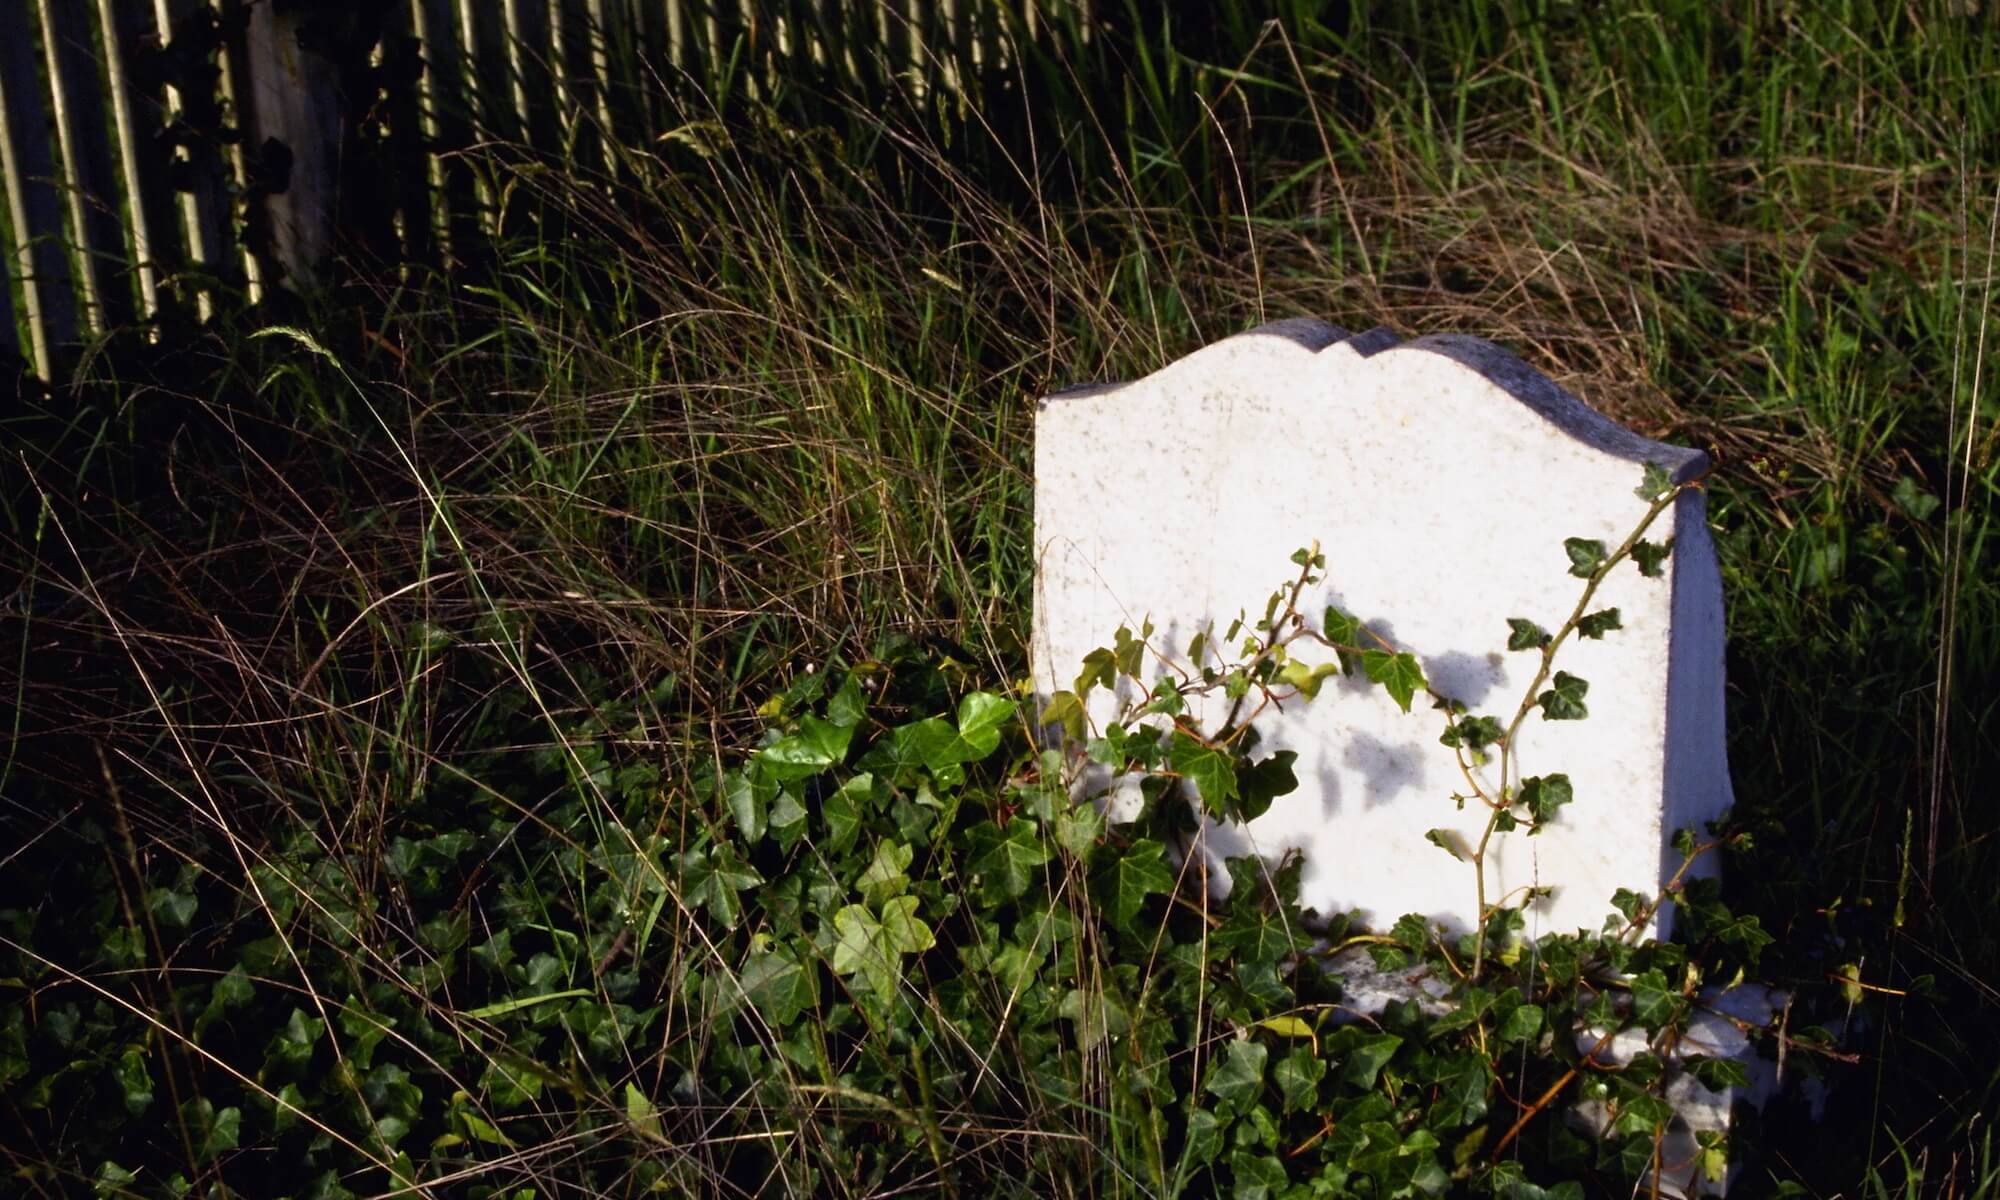 Grave Marker in Cemetery